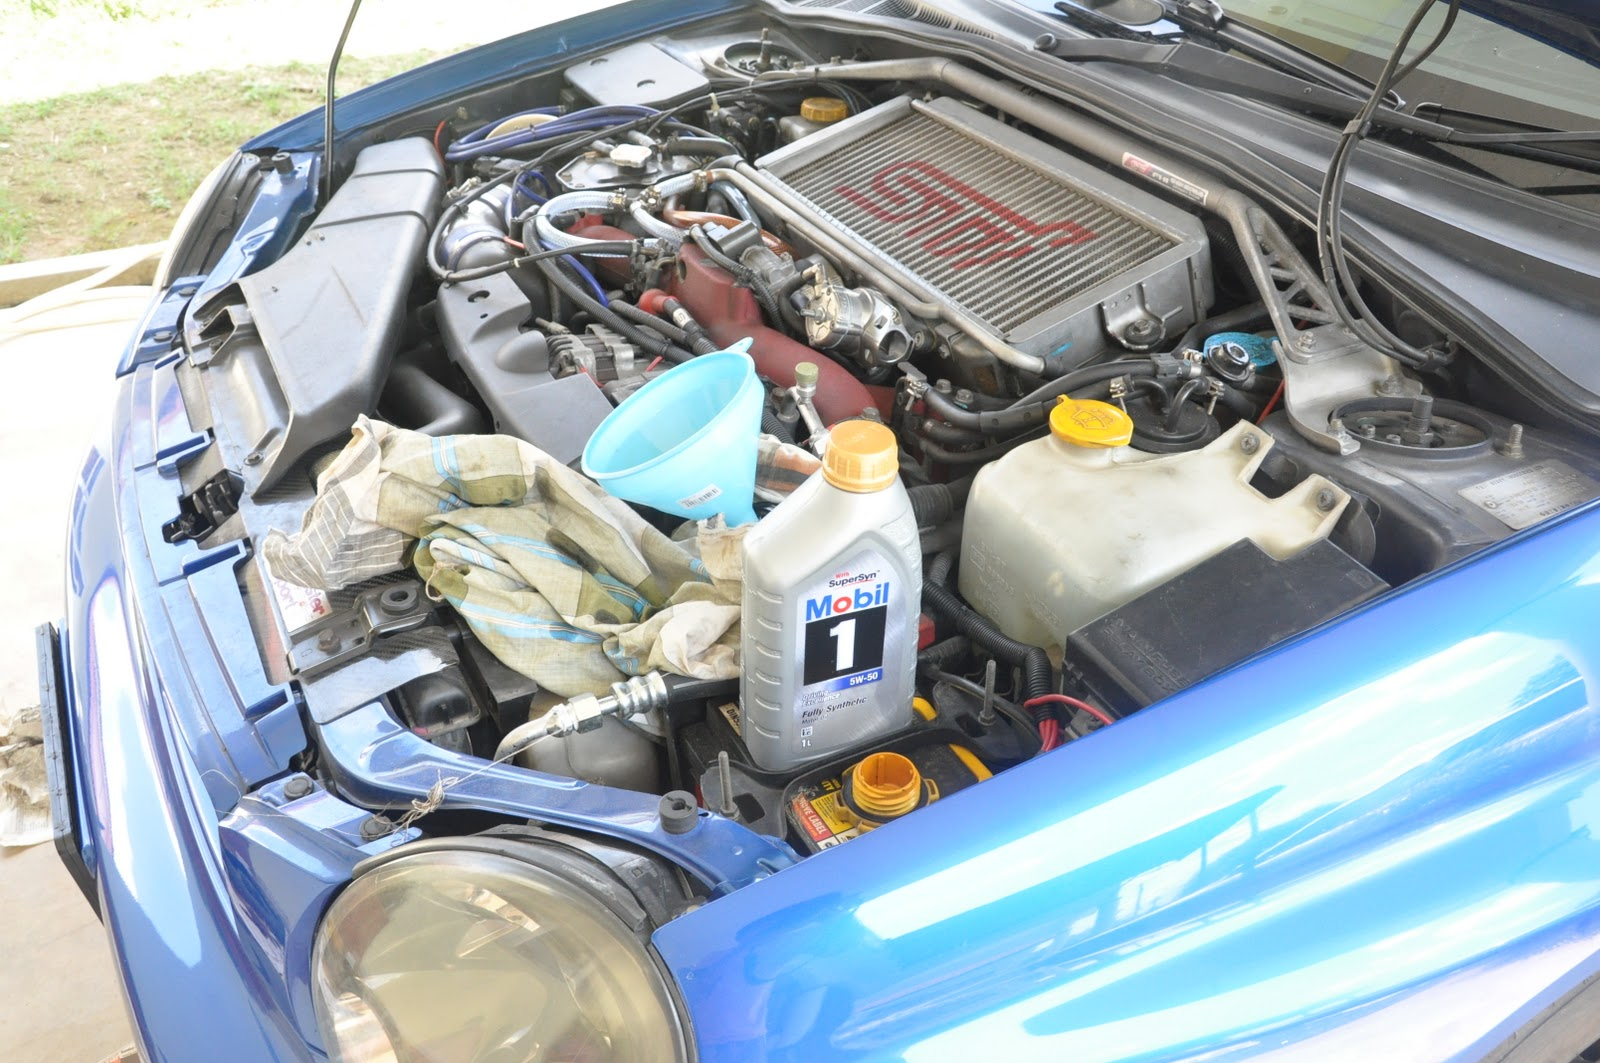 R N R AUTOSPORT - VEHICLE WIRING AND ENGINE MANAGEMENT TUNING: STI